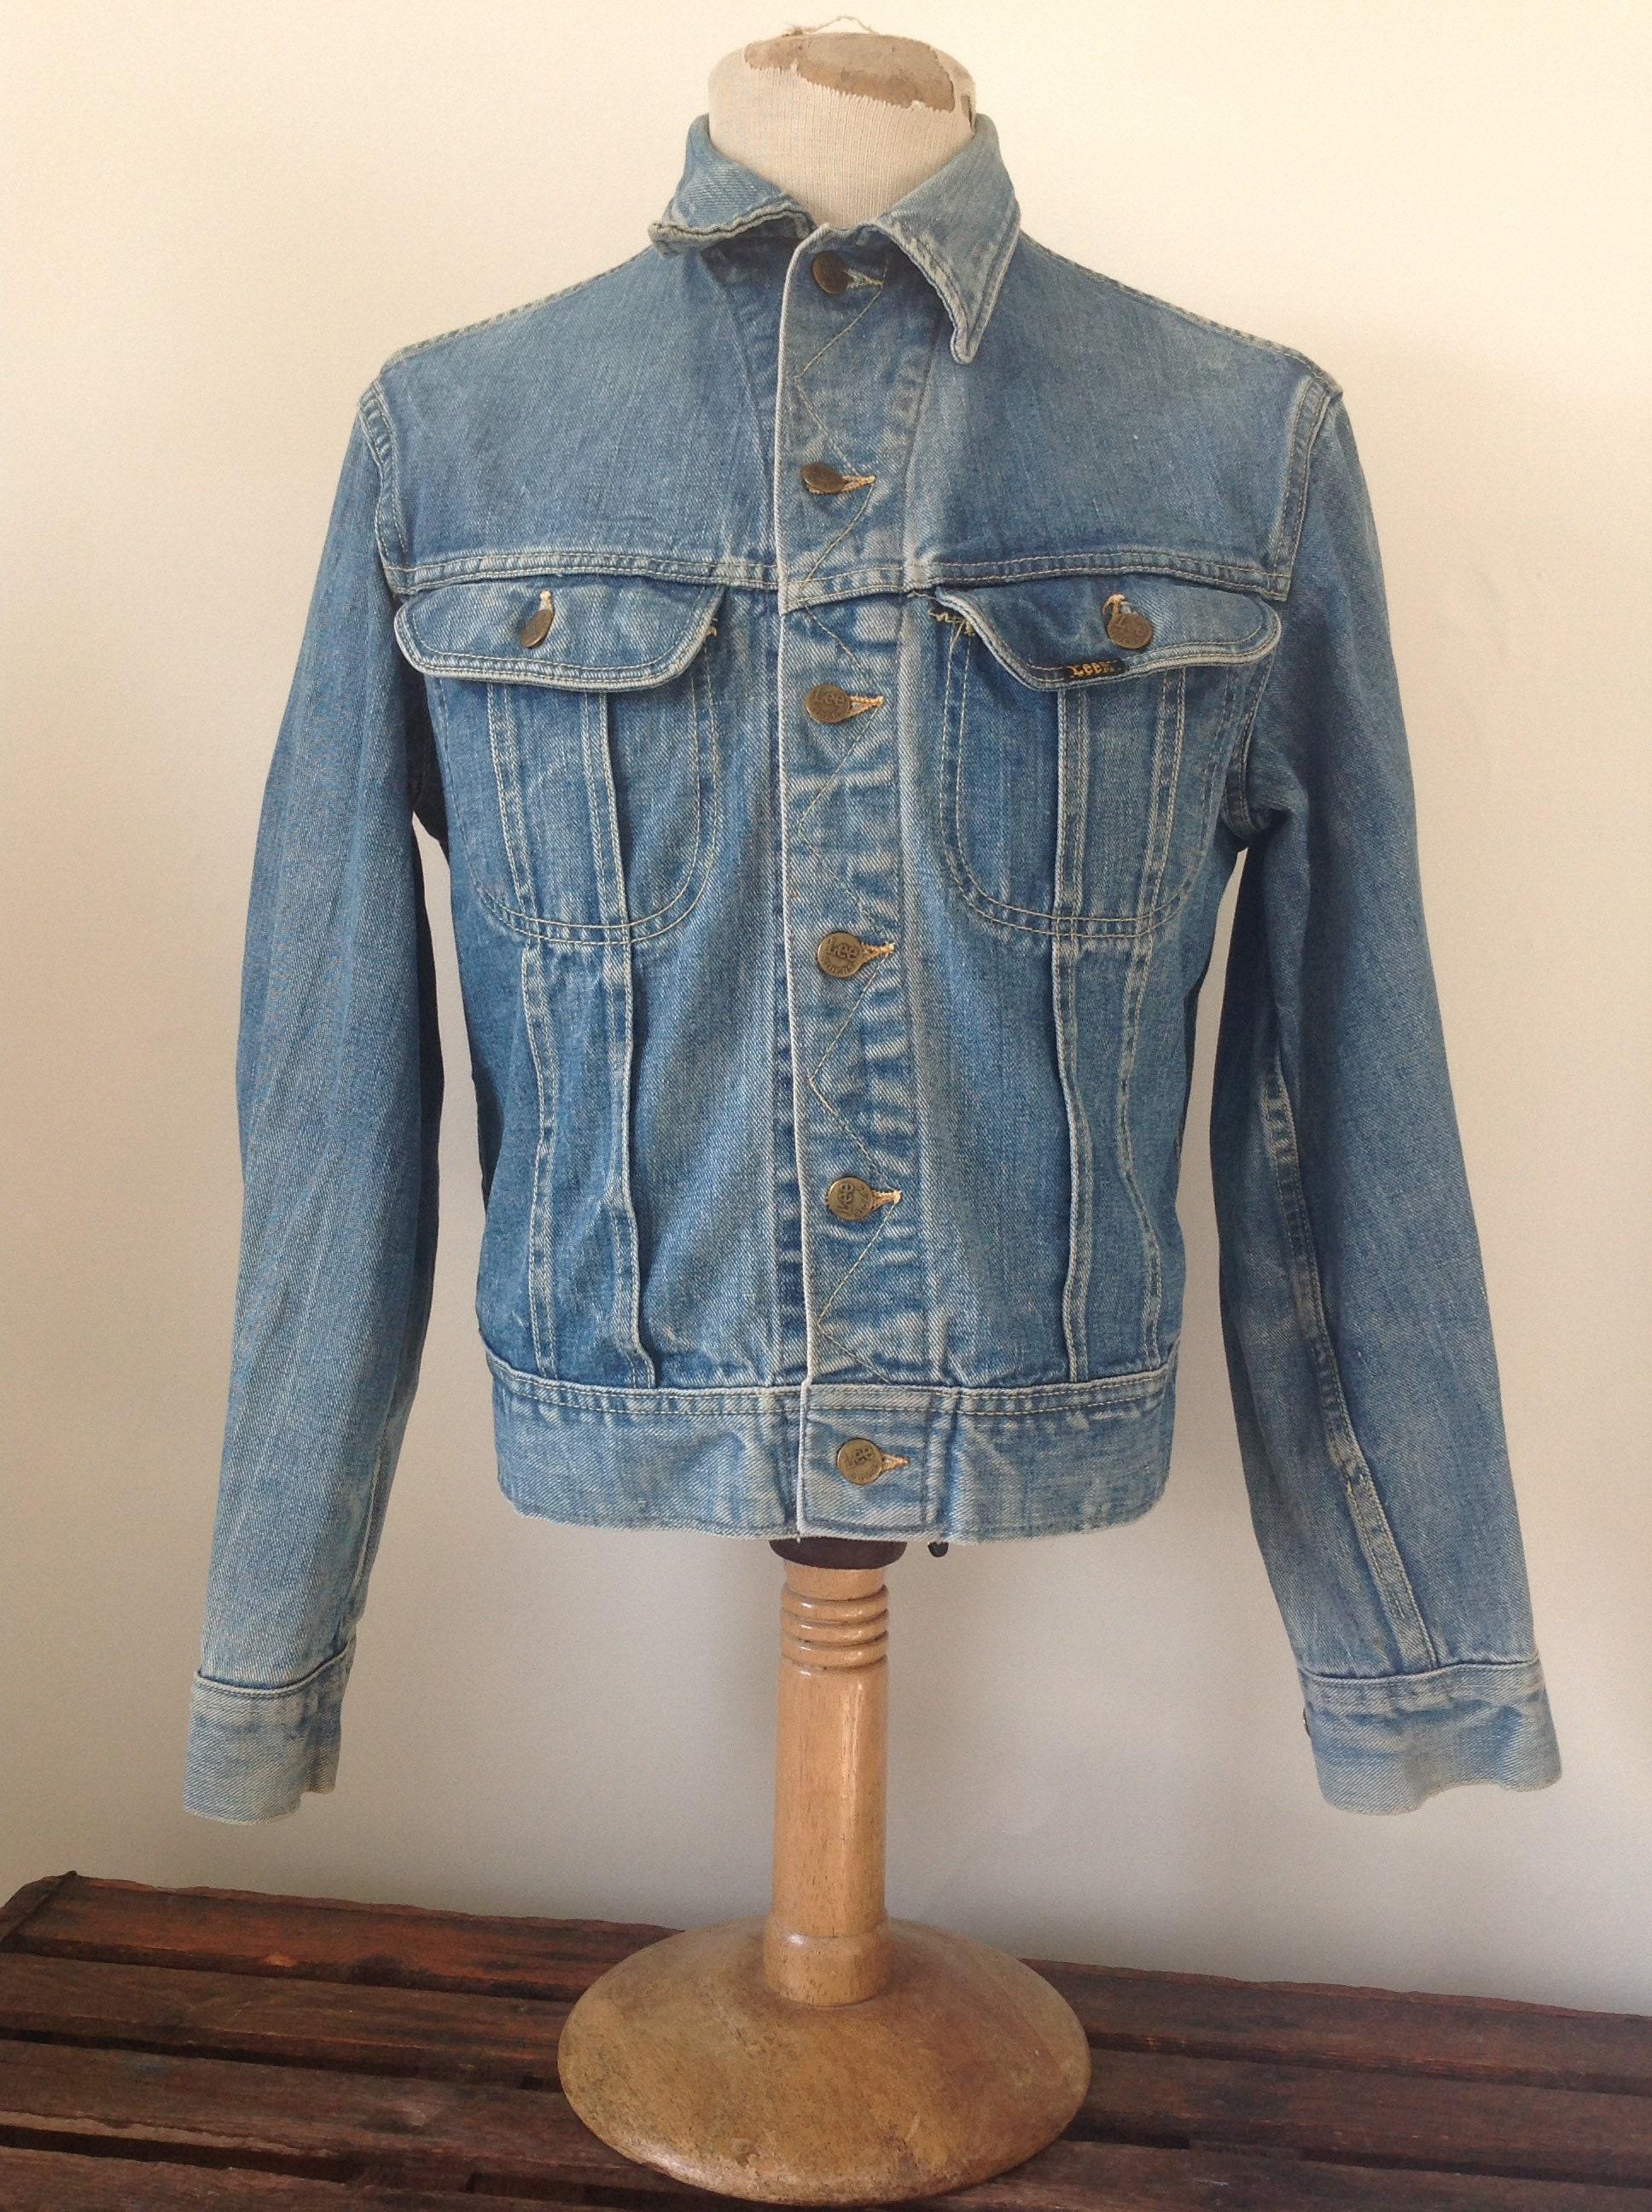 c462bed5 Vintage 1970s 70s Lee 101 denim trucker jacket work workwear chore 42 chest Union  Made sanforized made in USA